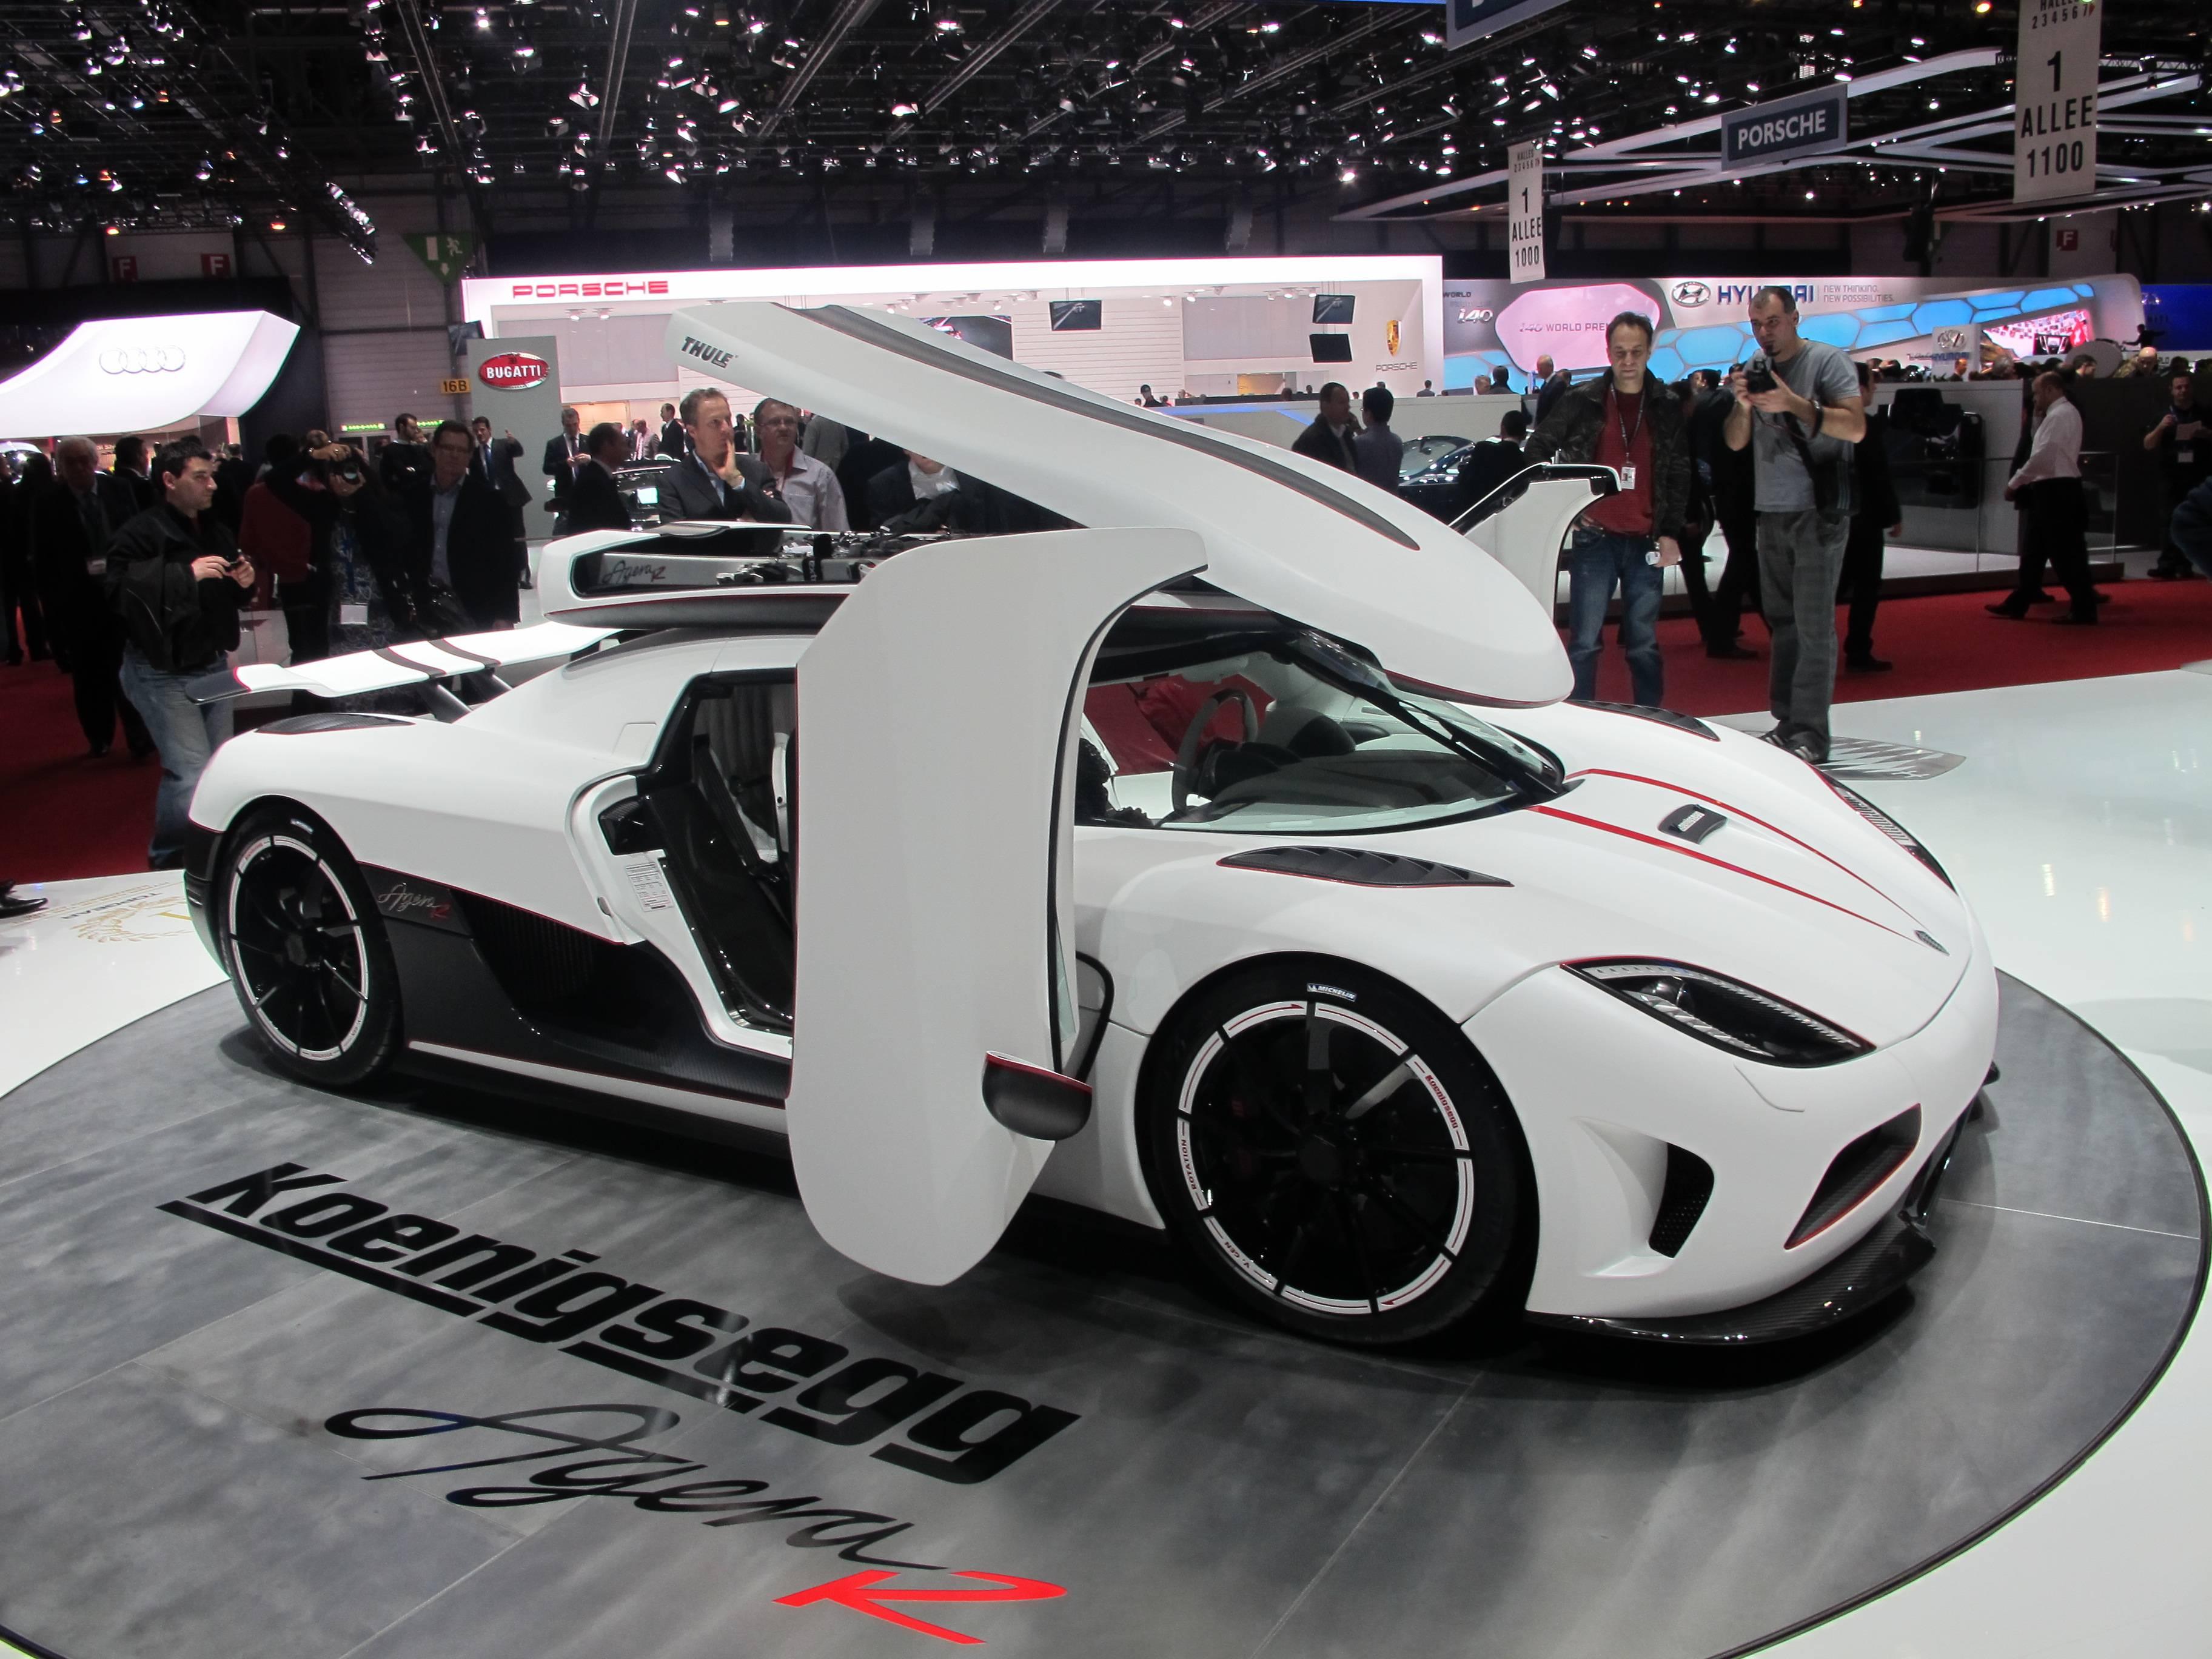 Geneva Motor Show - Koenigsegg Agera R